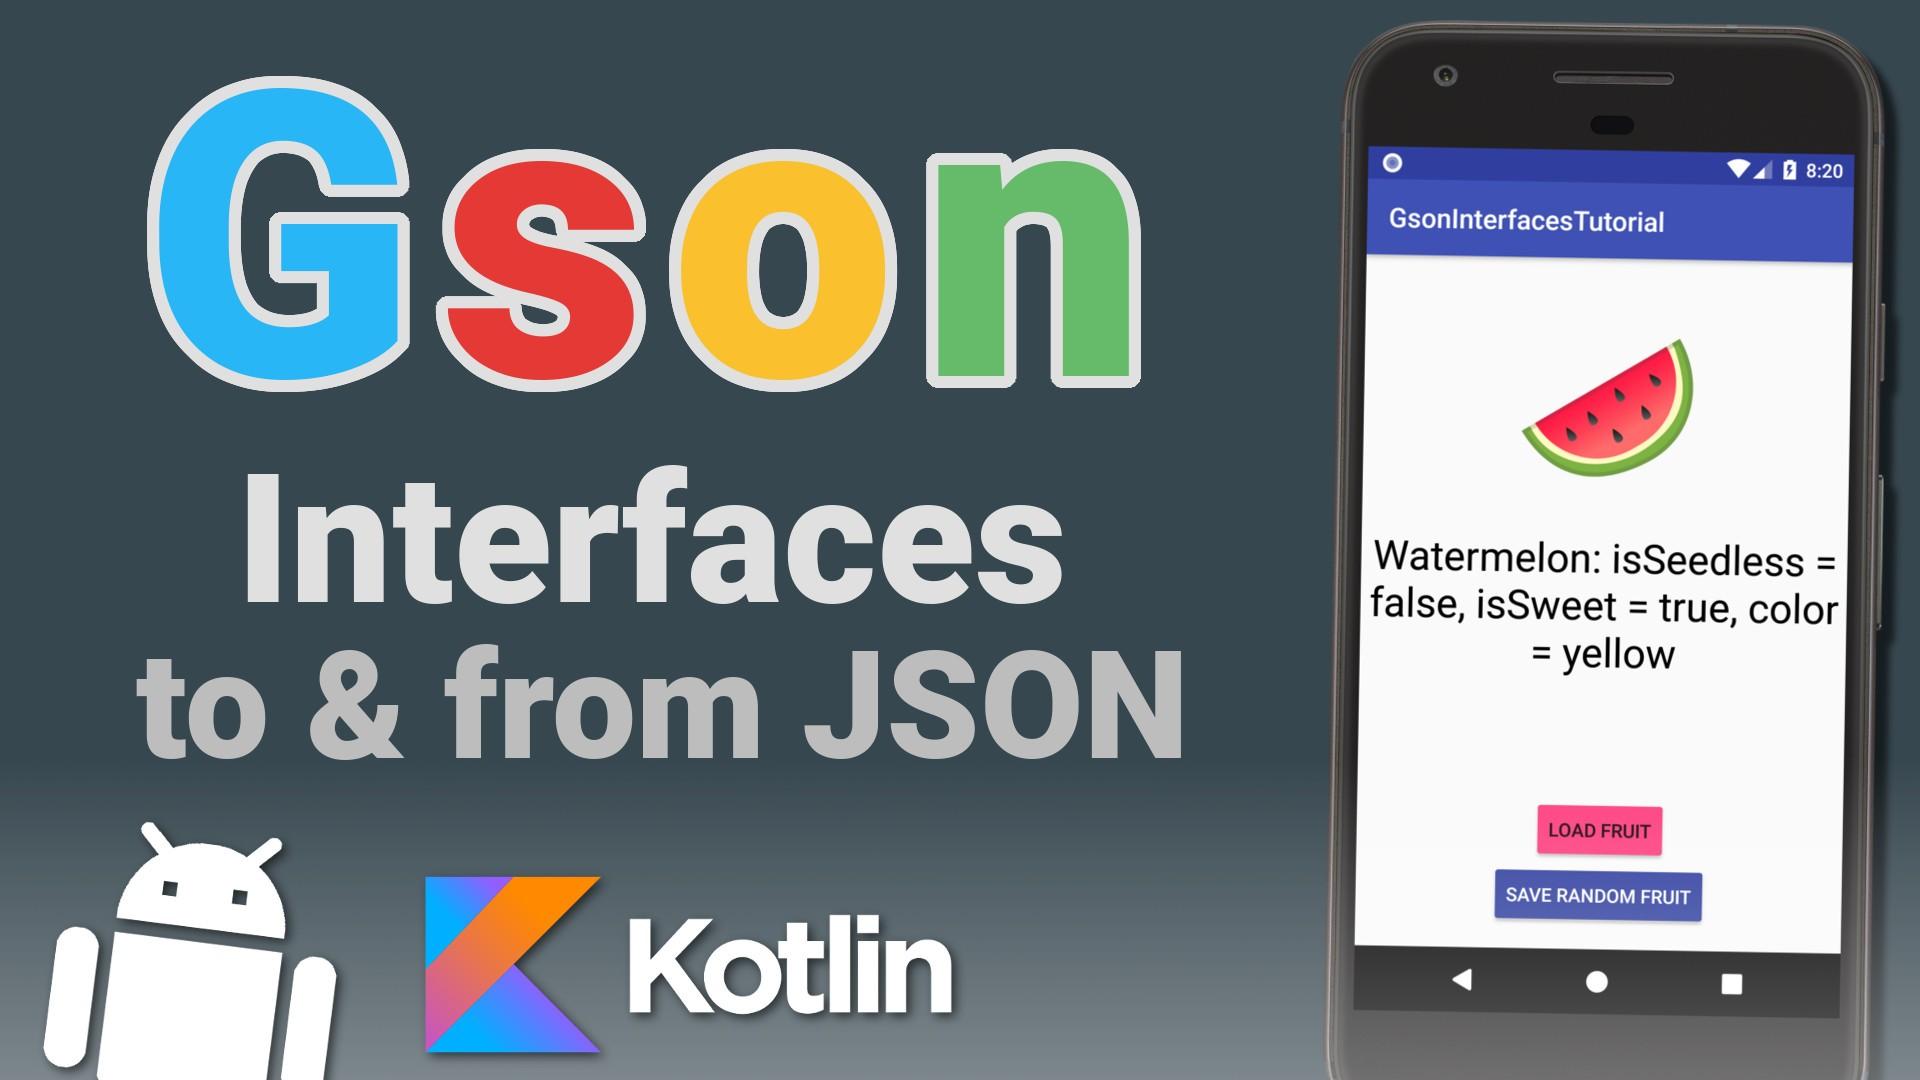 Gson Interfaces